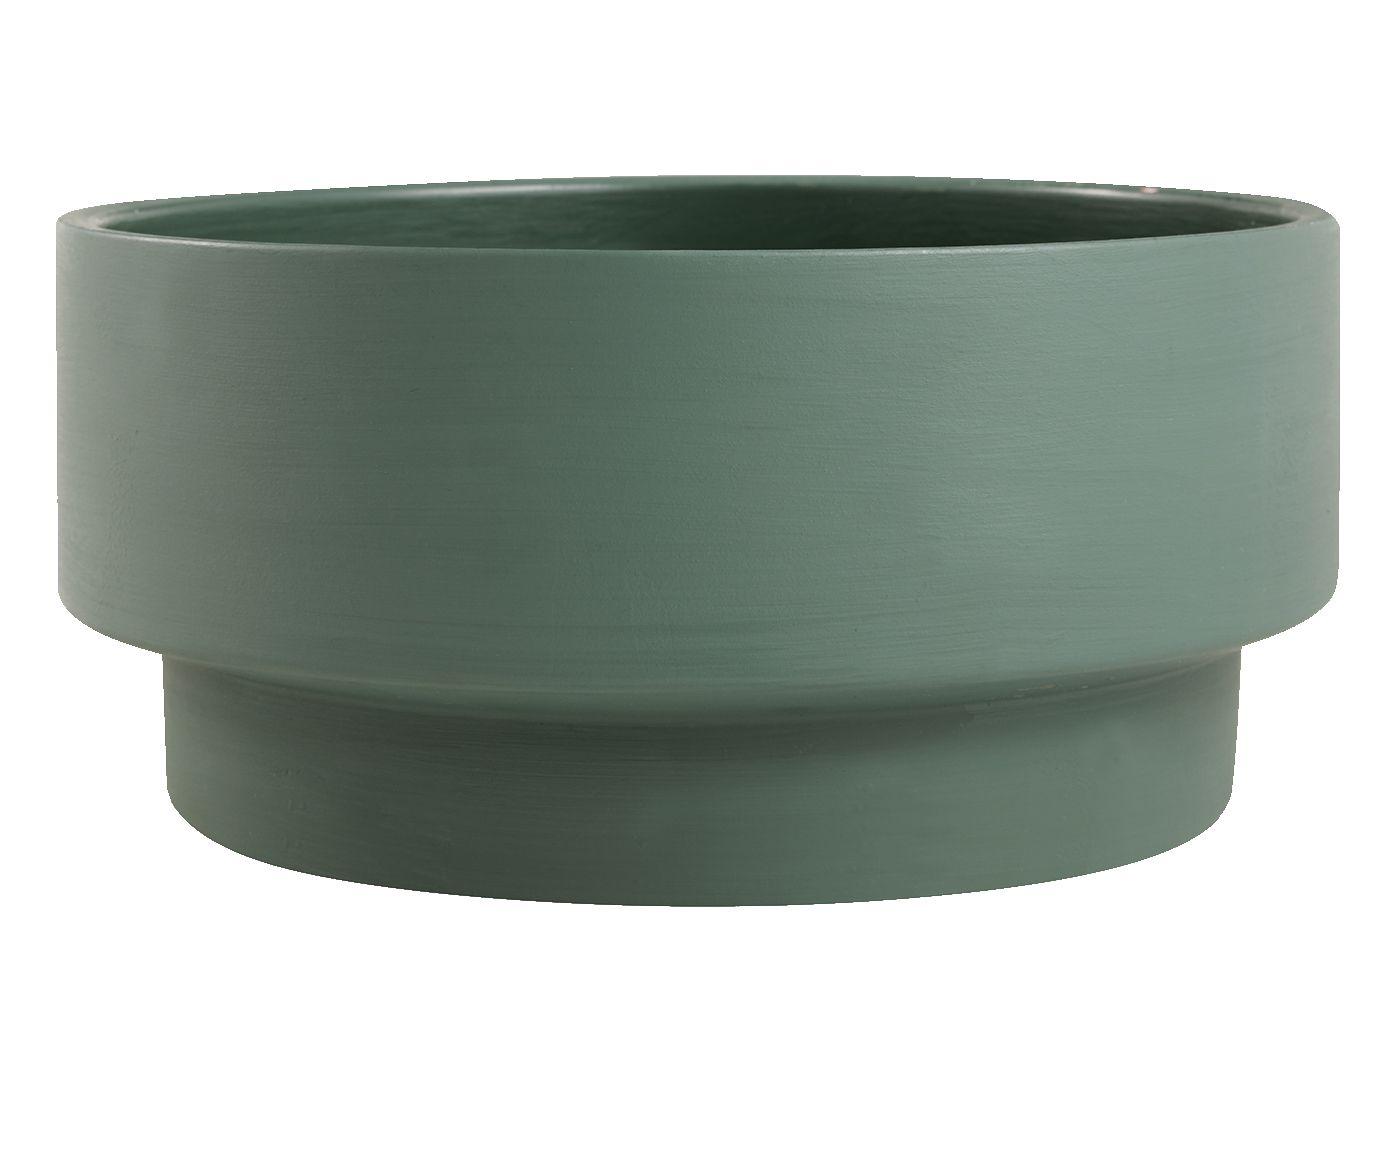 Cachepot Antlia Verde - 10,5X23cm | Westwing.com.br